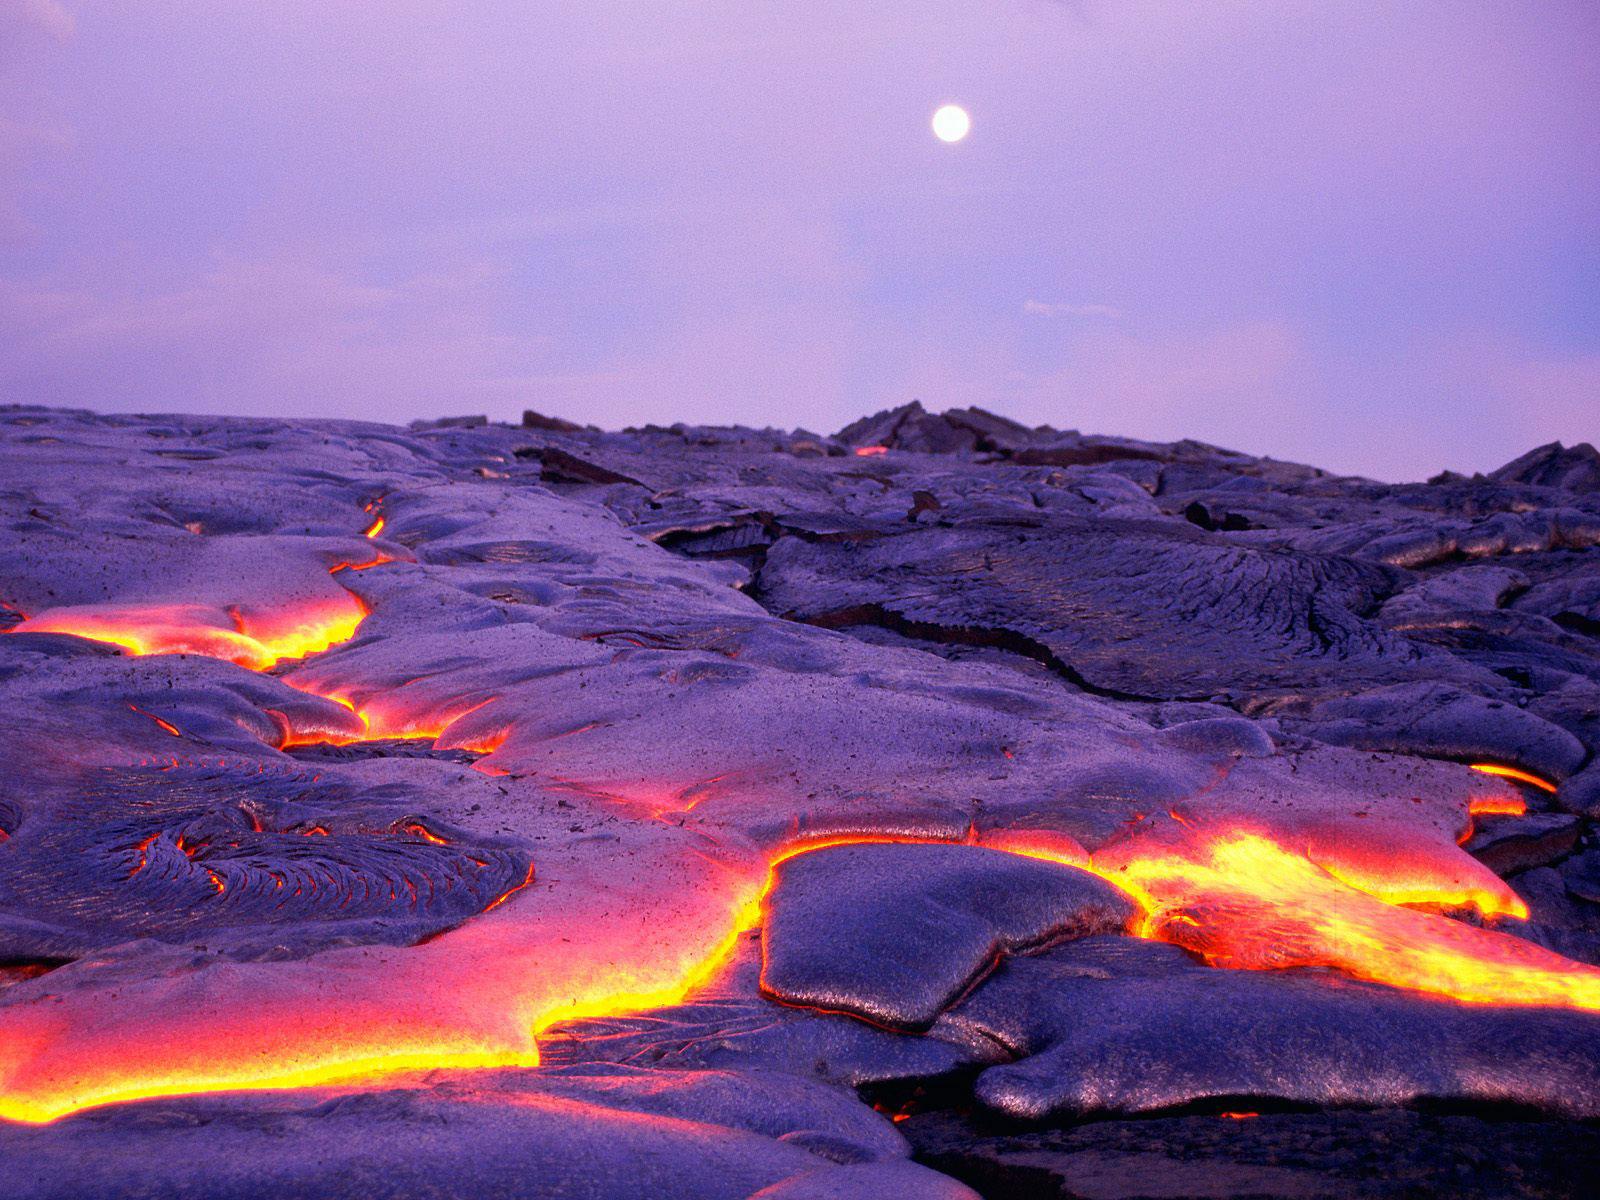 Hawaii Volcanoes Celebrates 25th anniversary as World Heritage ...